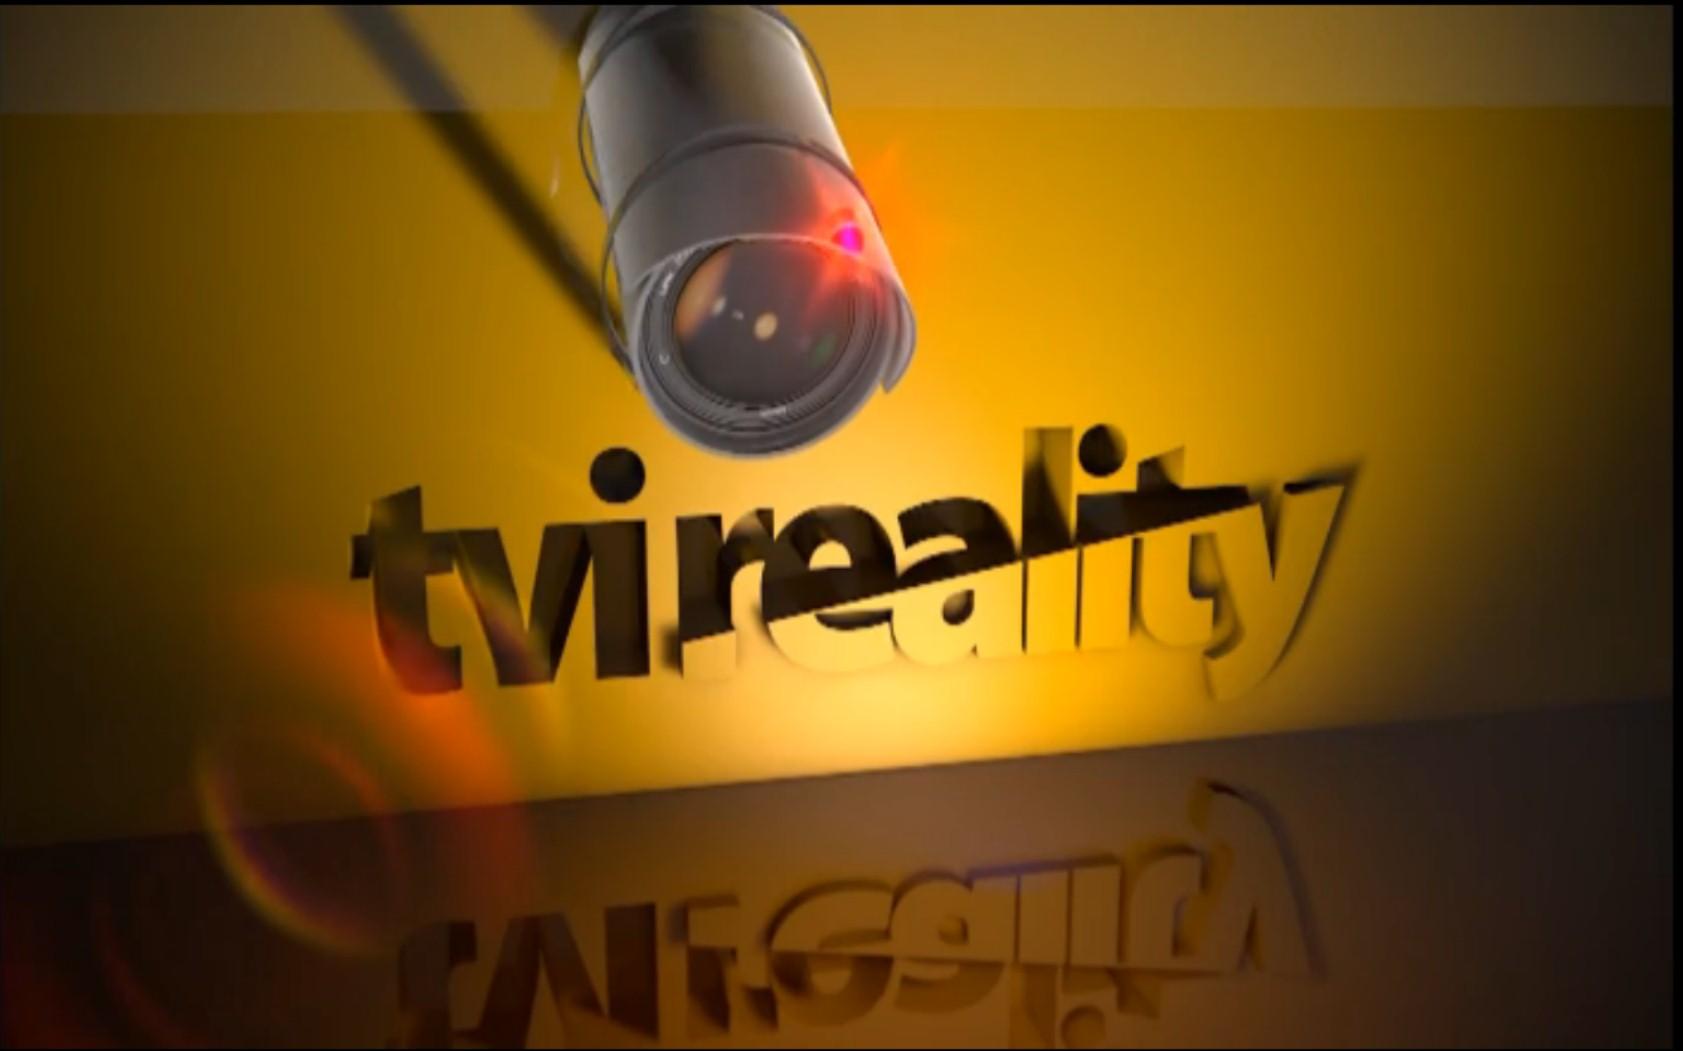 TVI_reality2